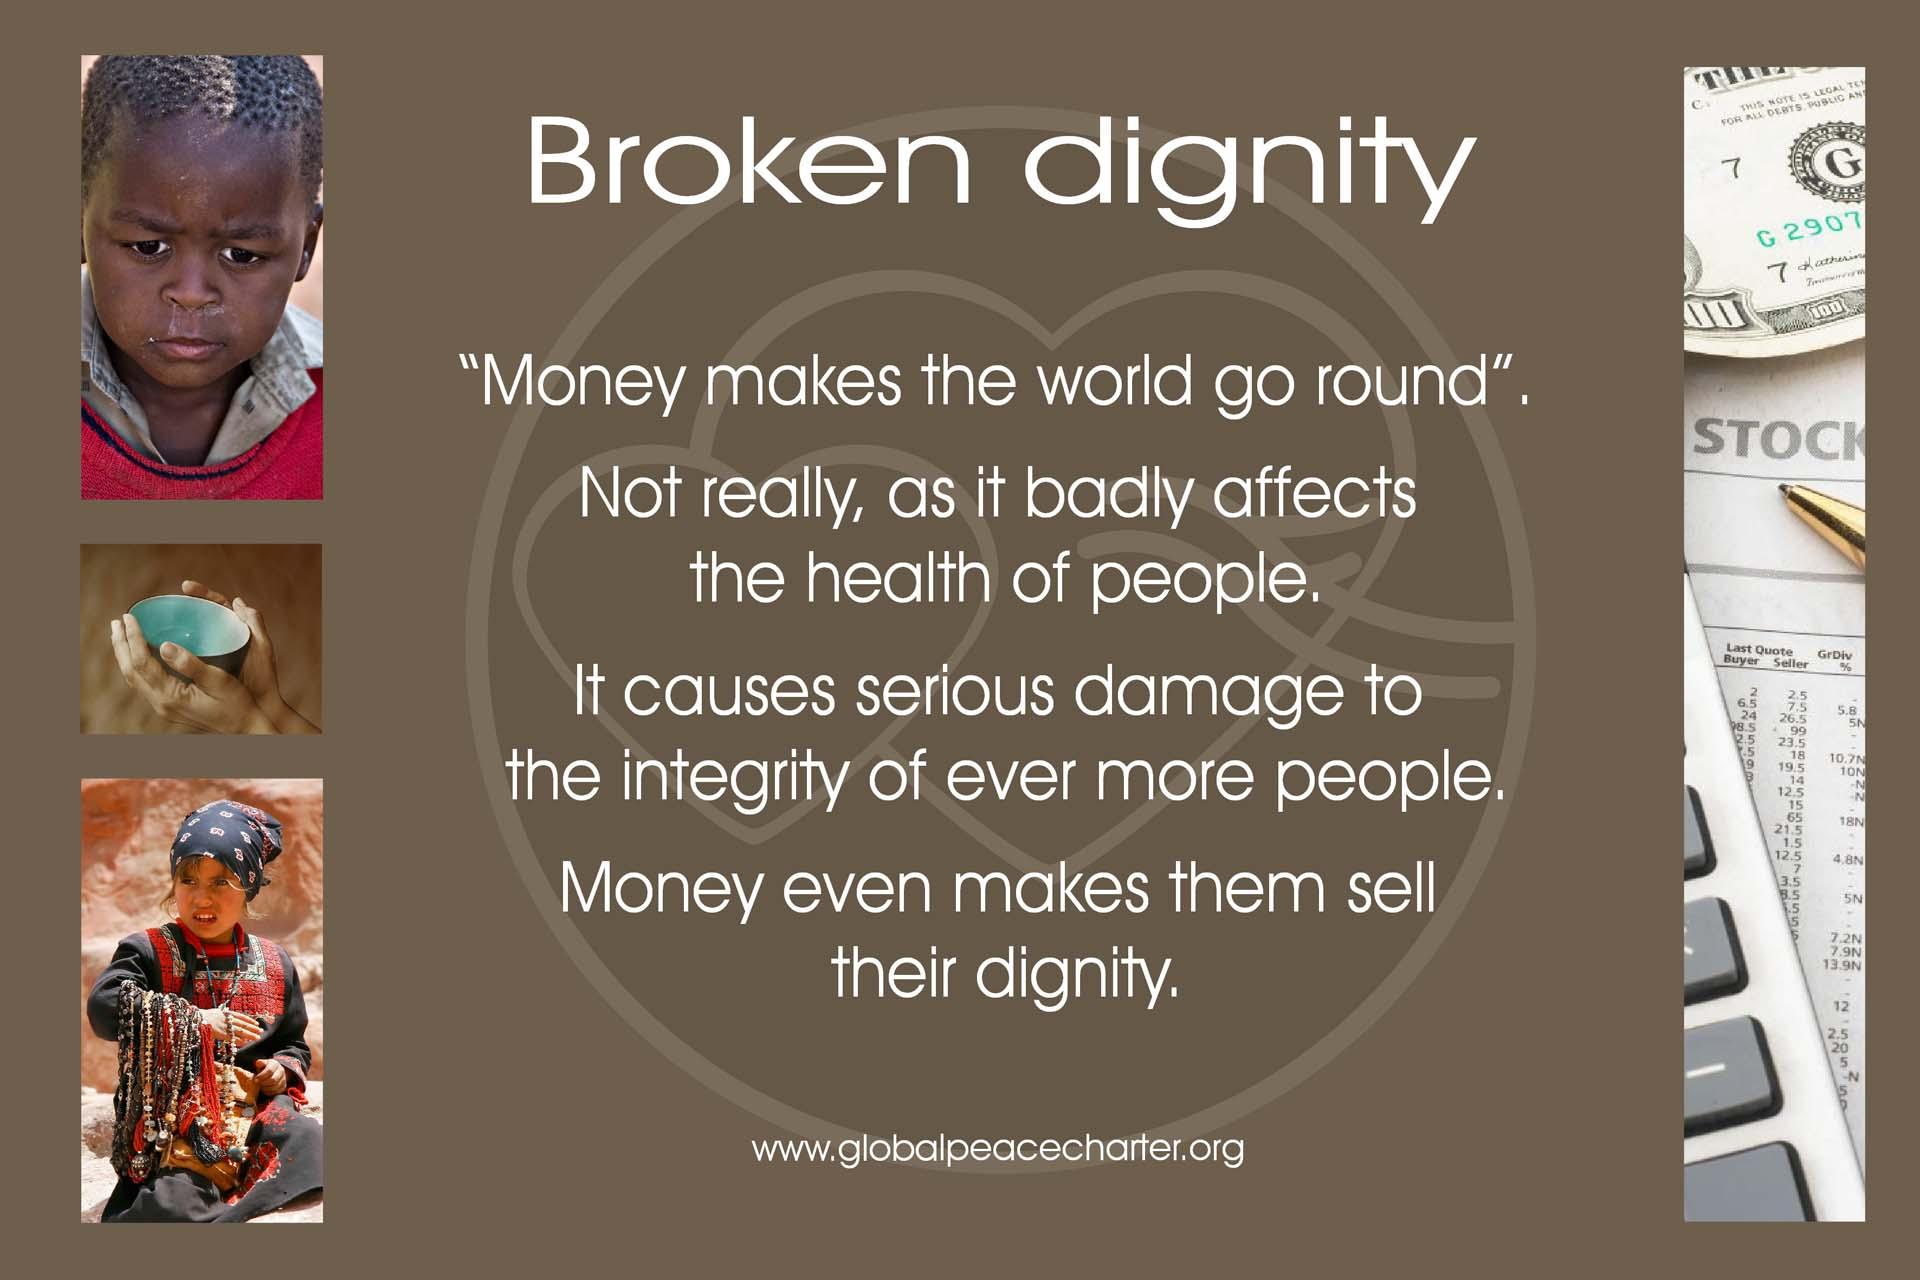 Broken dignity